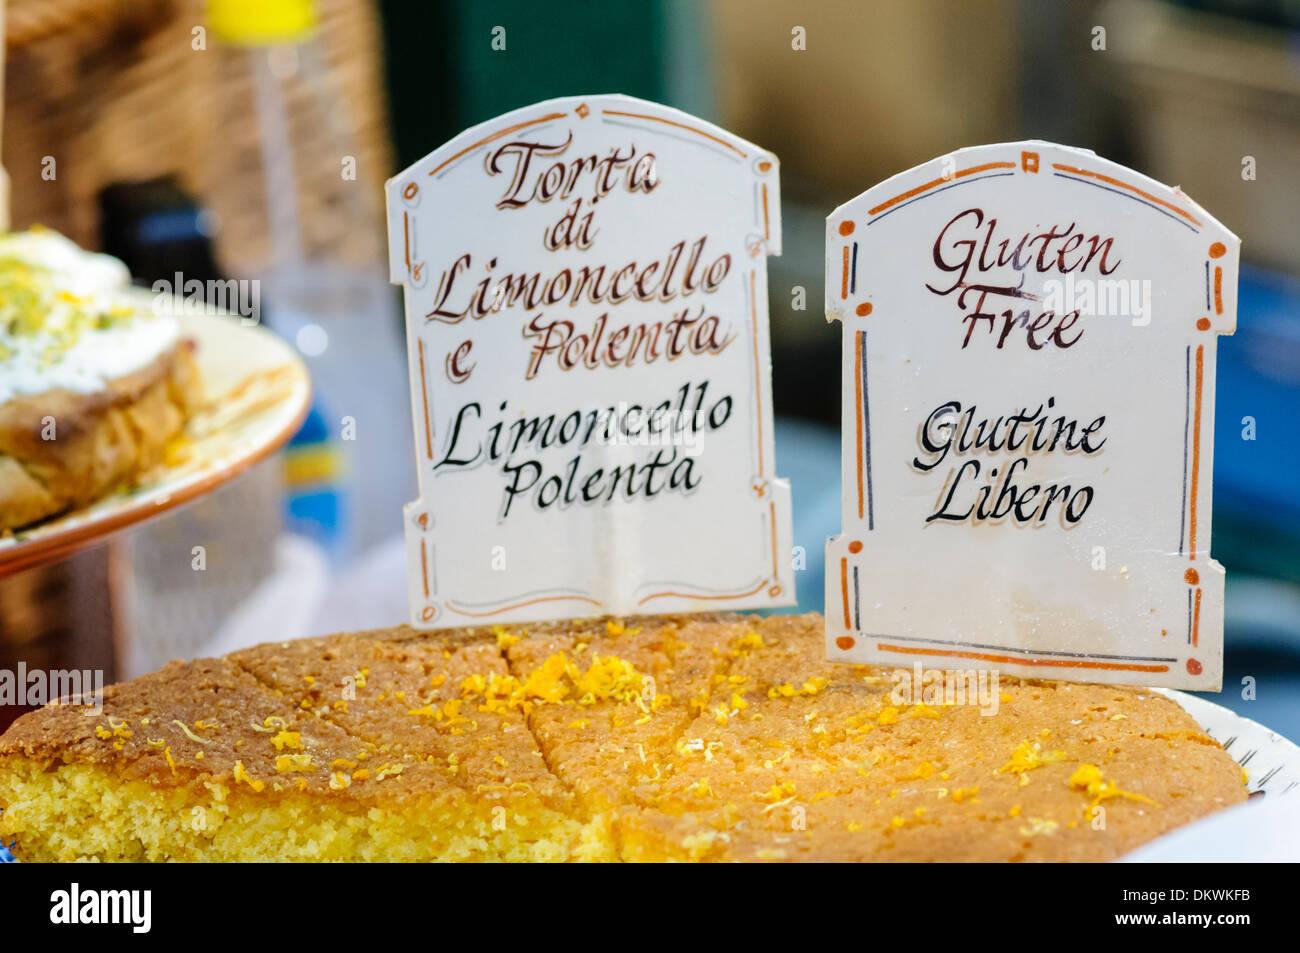 Limoncello polenta (torta di limoncello e Polenta) on a market stall with 'Gluten Free' sign (with an incorrect translation into Italian) - Stock Image